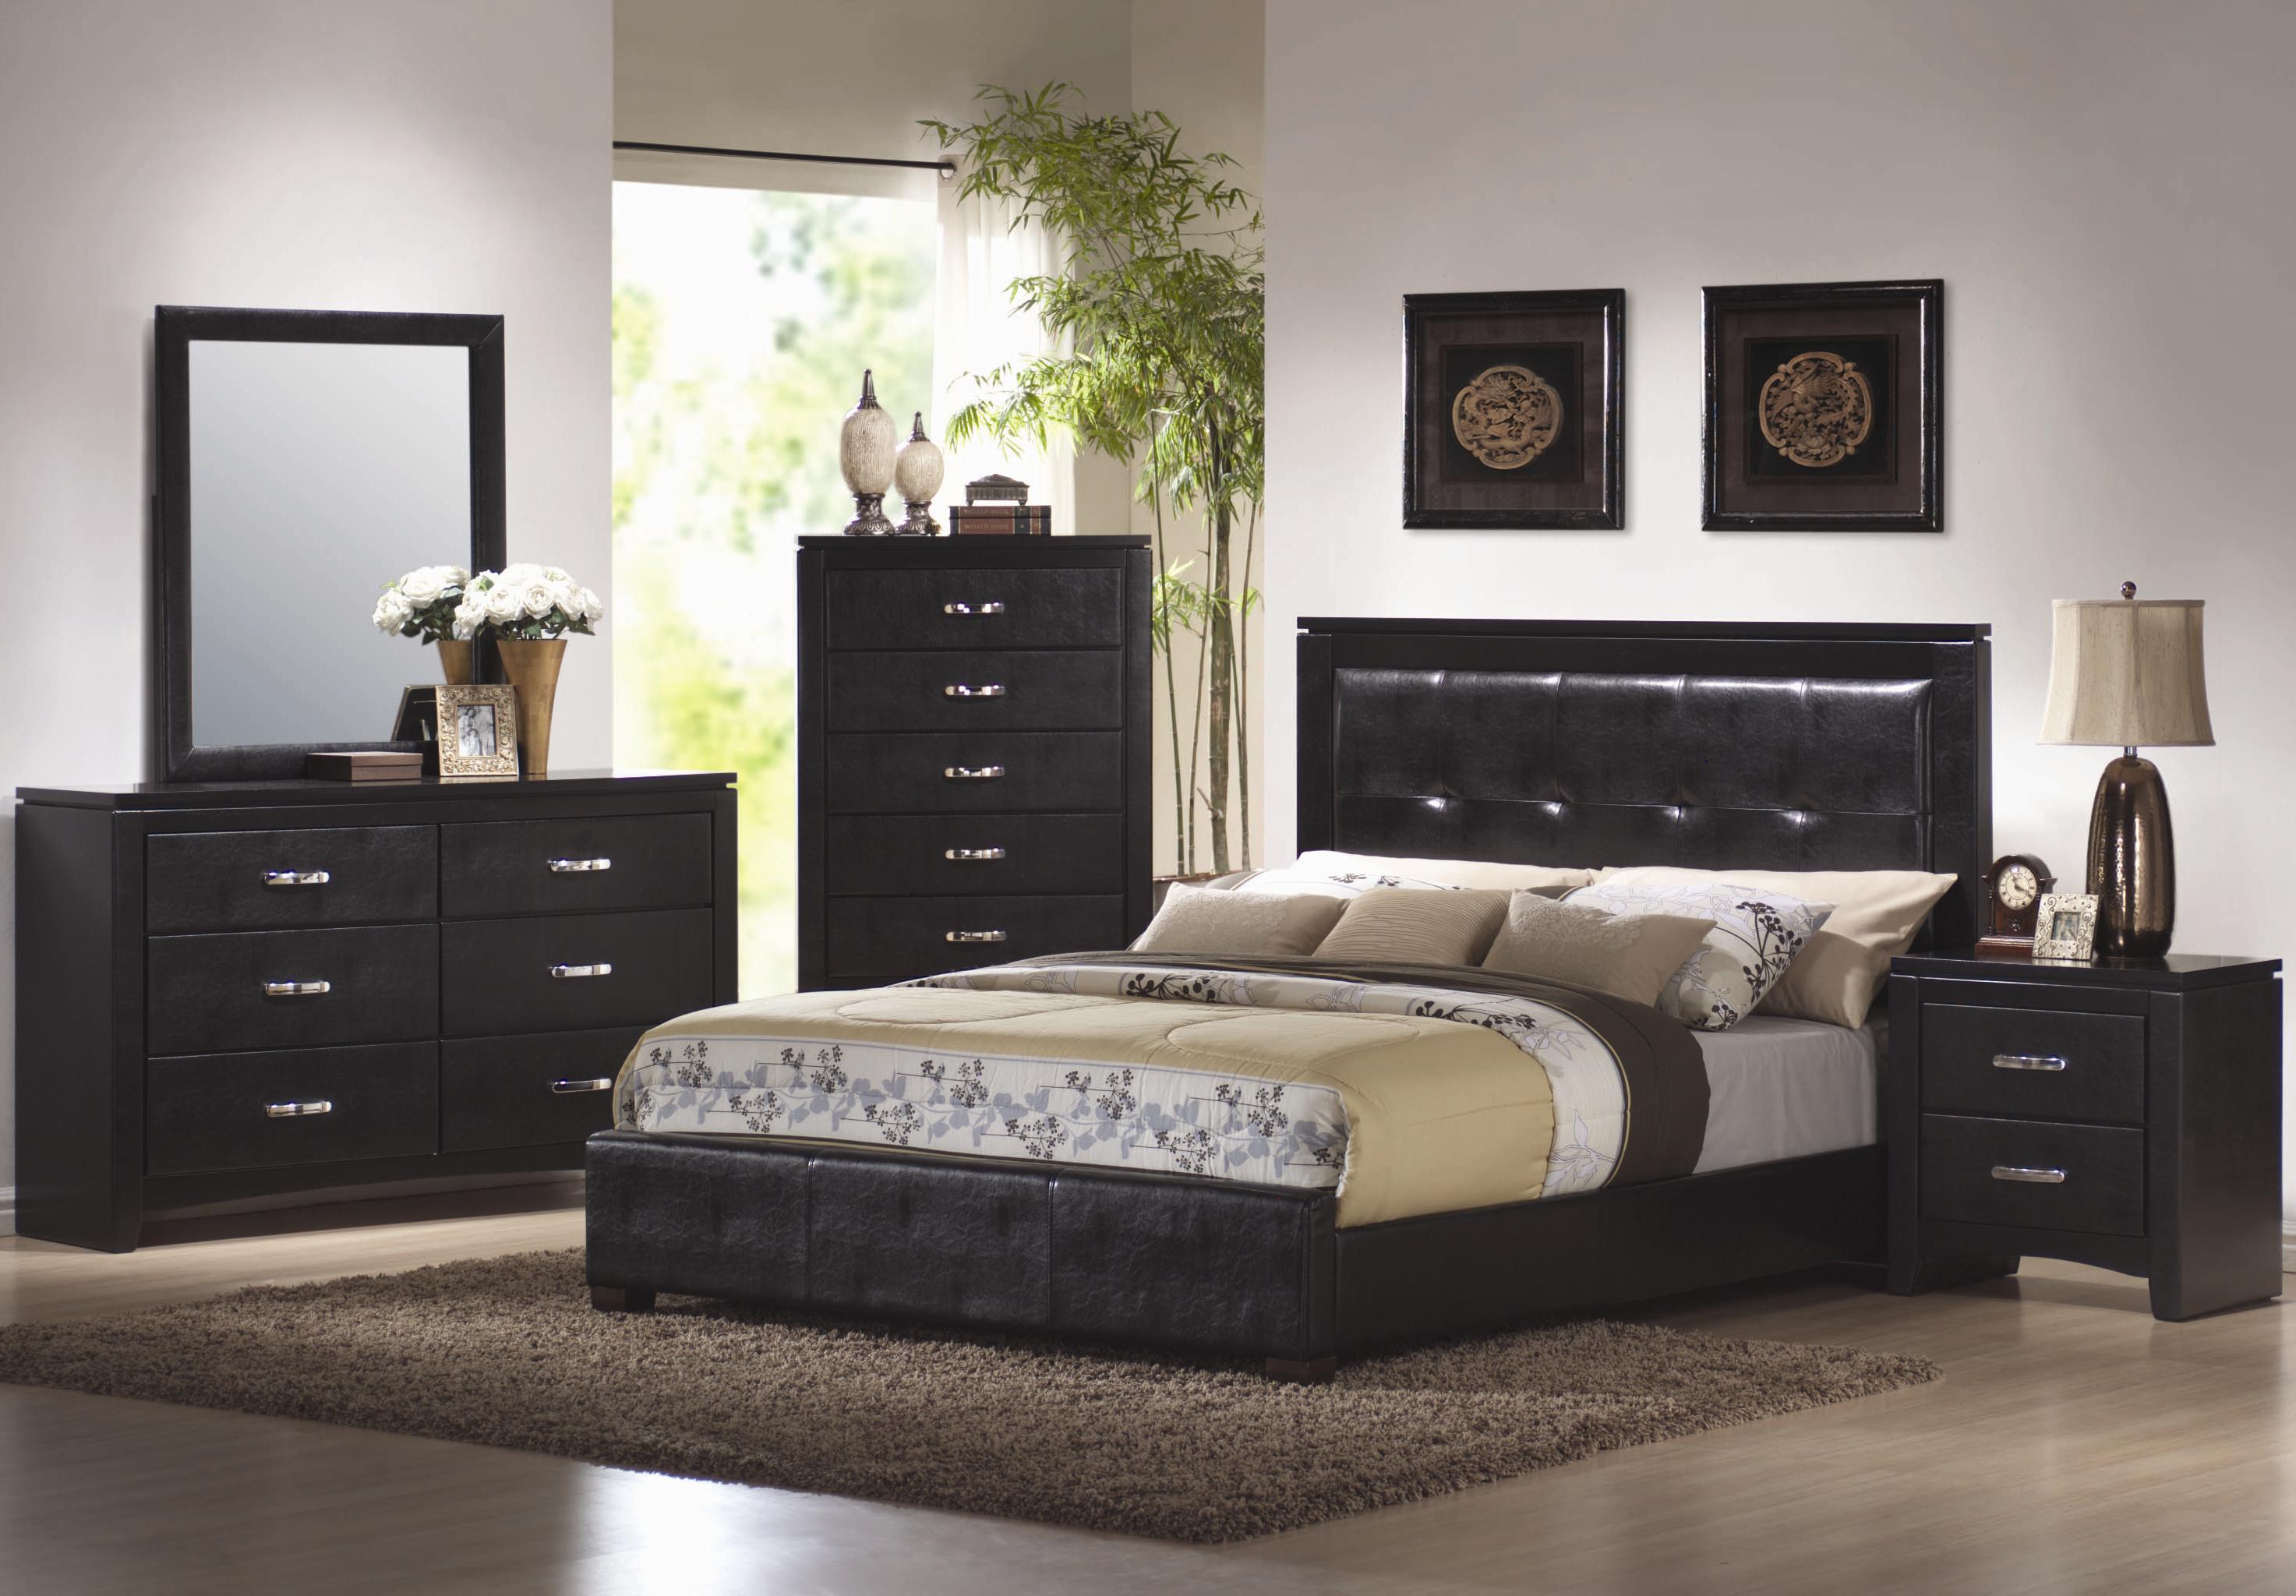 Coaster Dylan California King Bedroom Group - Item Number: 201400 CK Bedroom Group 1